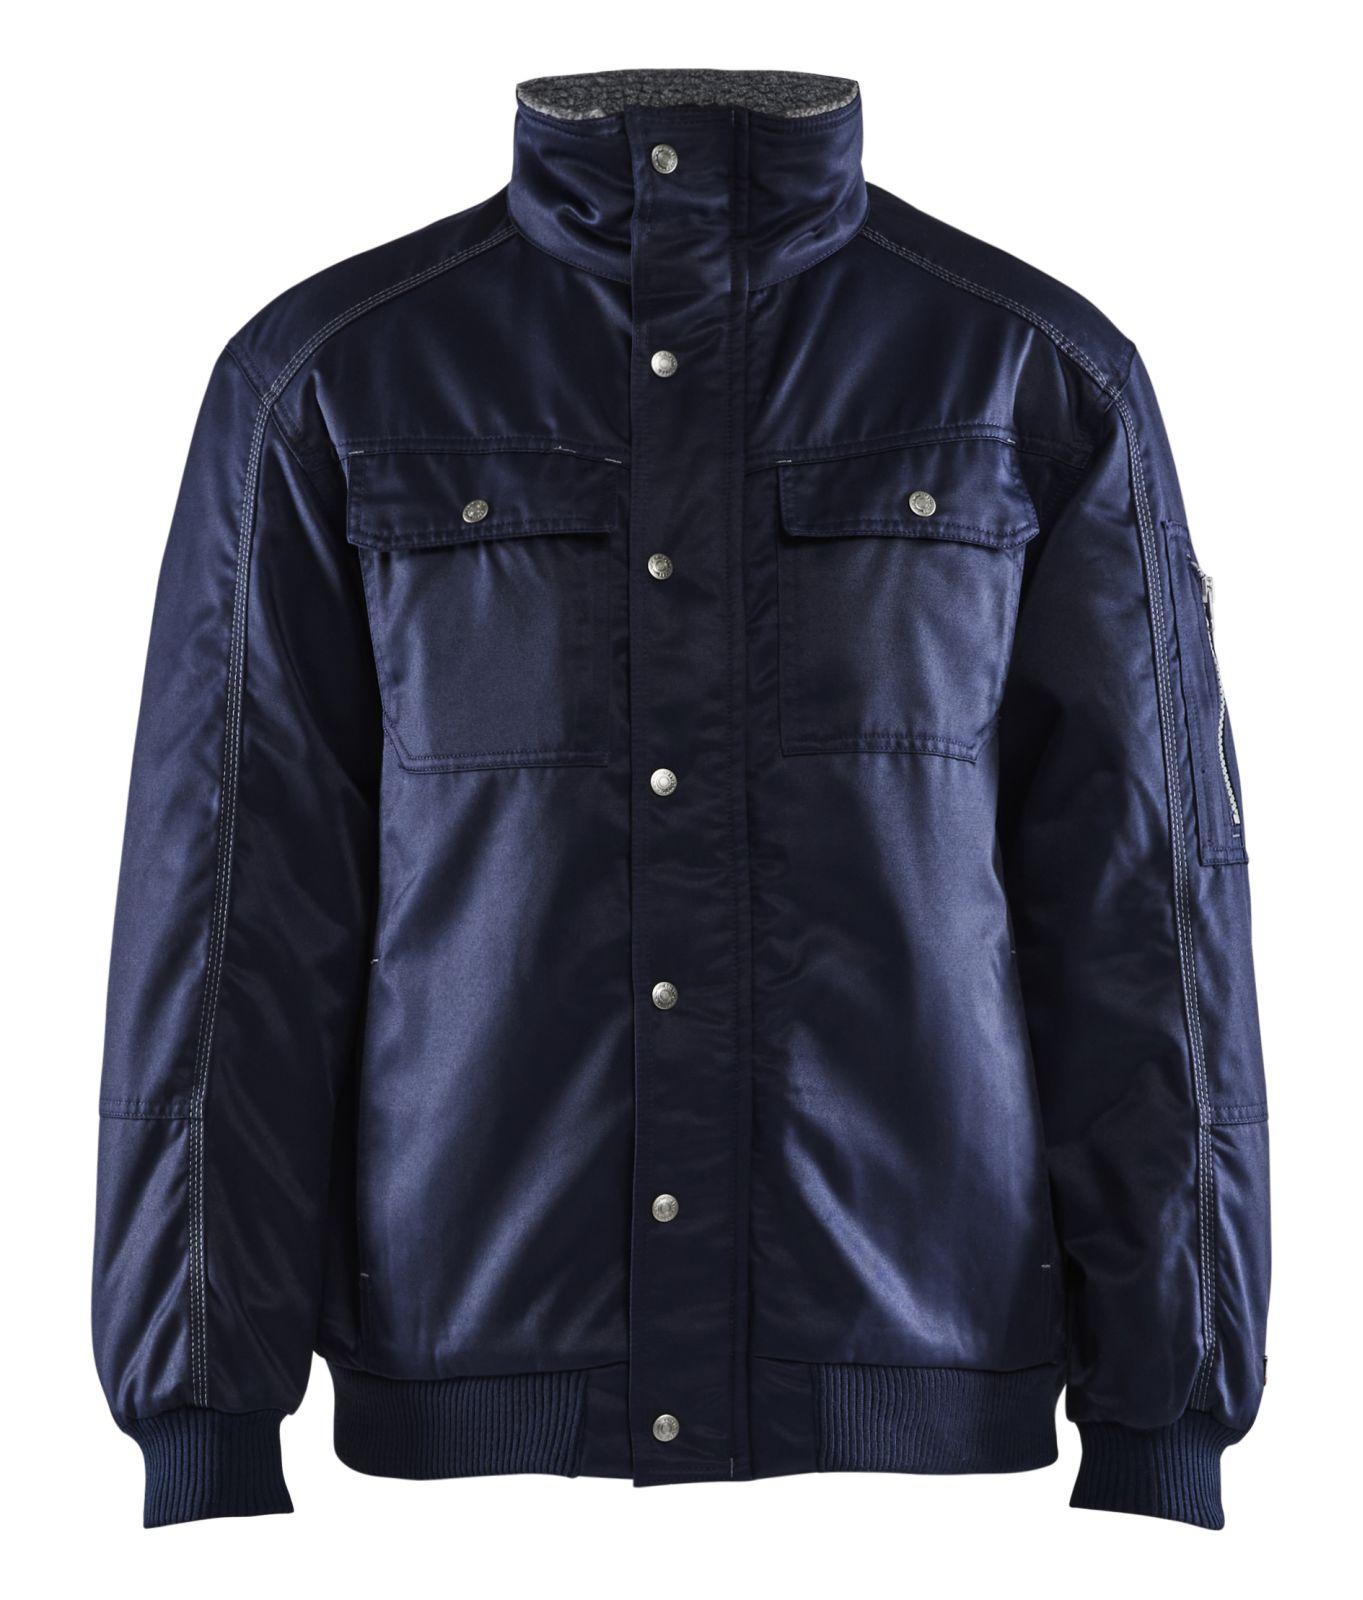 Blaklader Pilot jacks 49161900 marineblauw(8800)